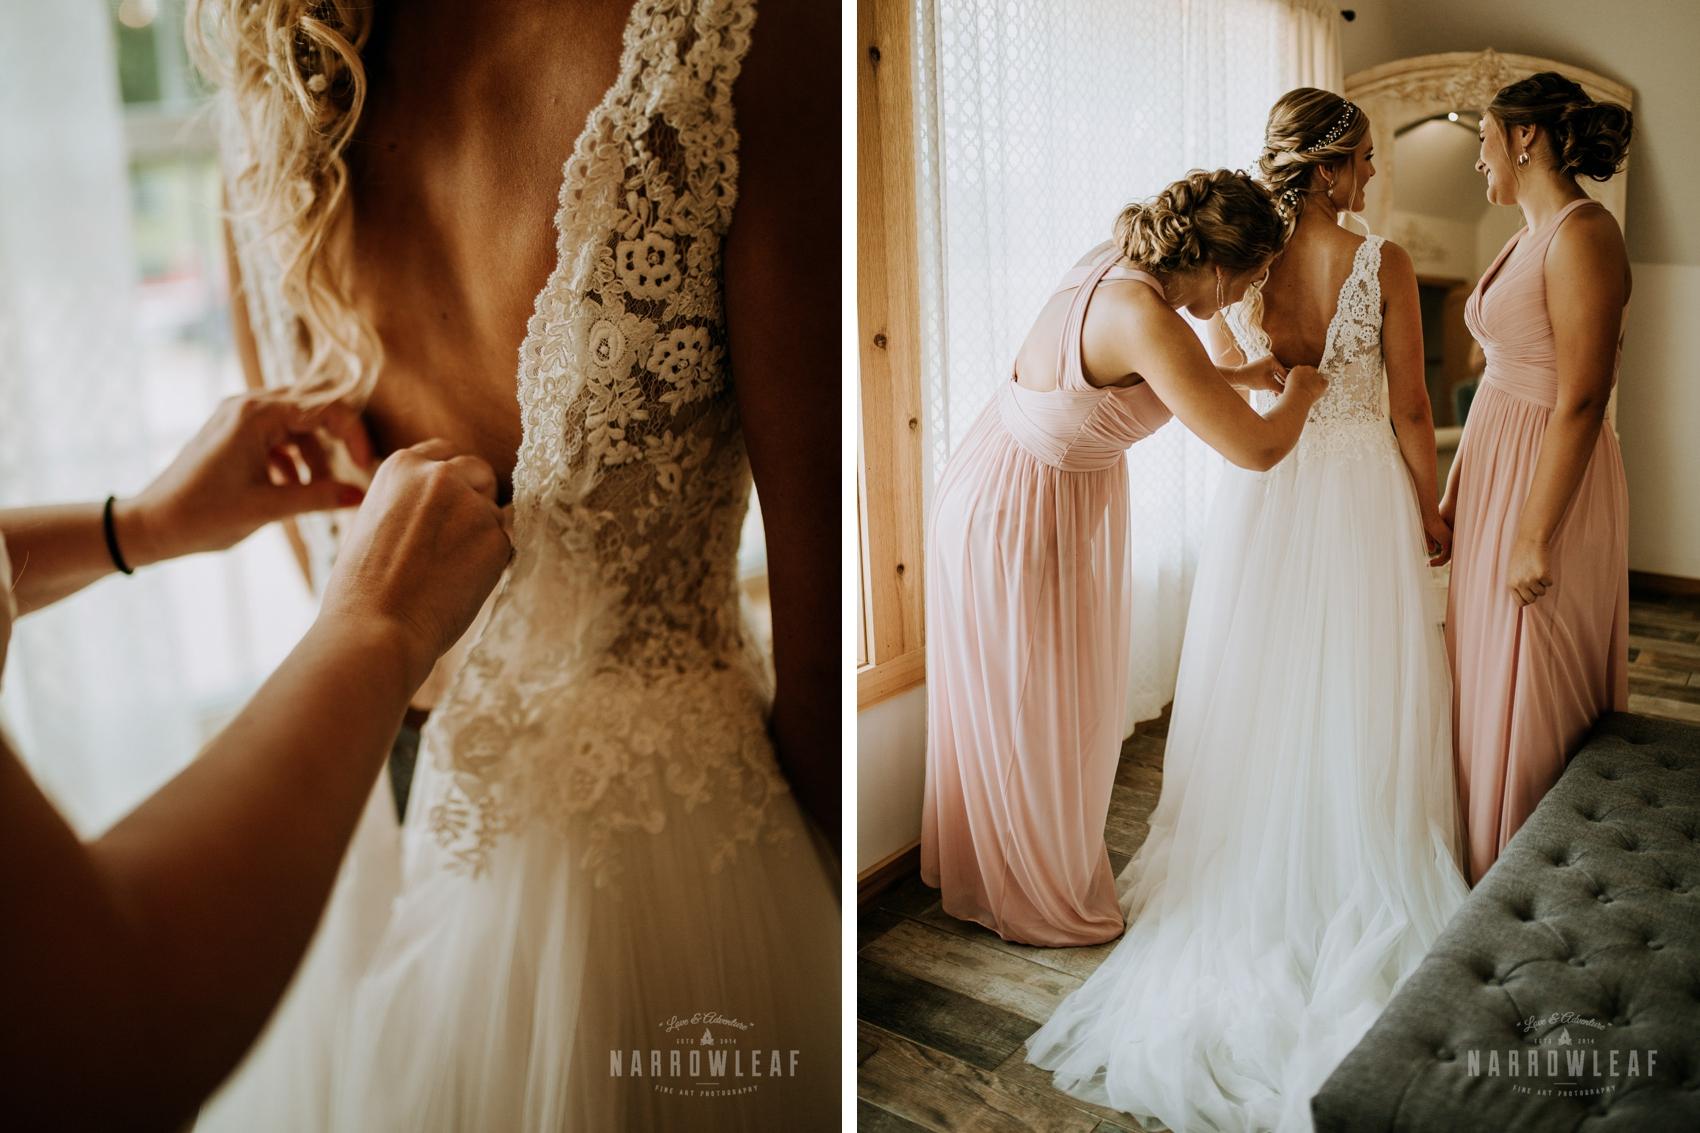 minnesota-wedding-photographer-moody-narrowleaf-photography007-008.jpg